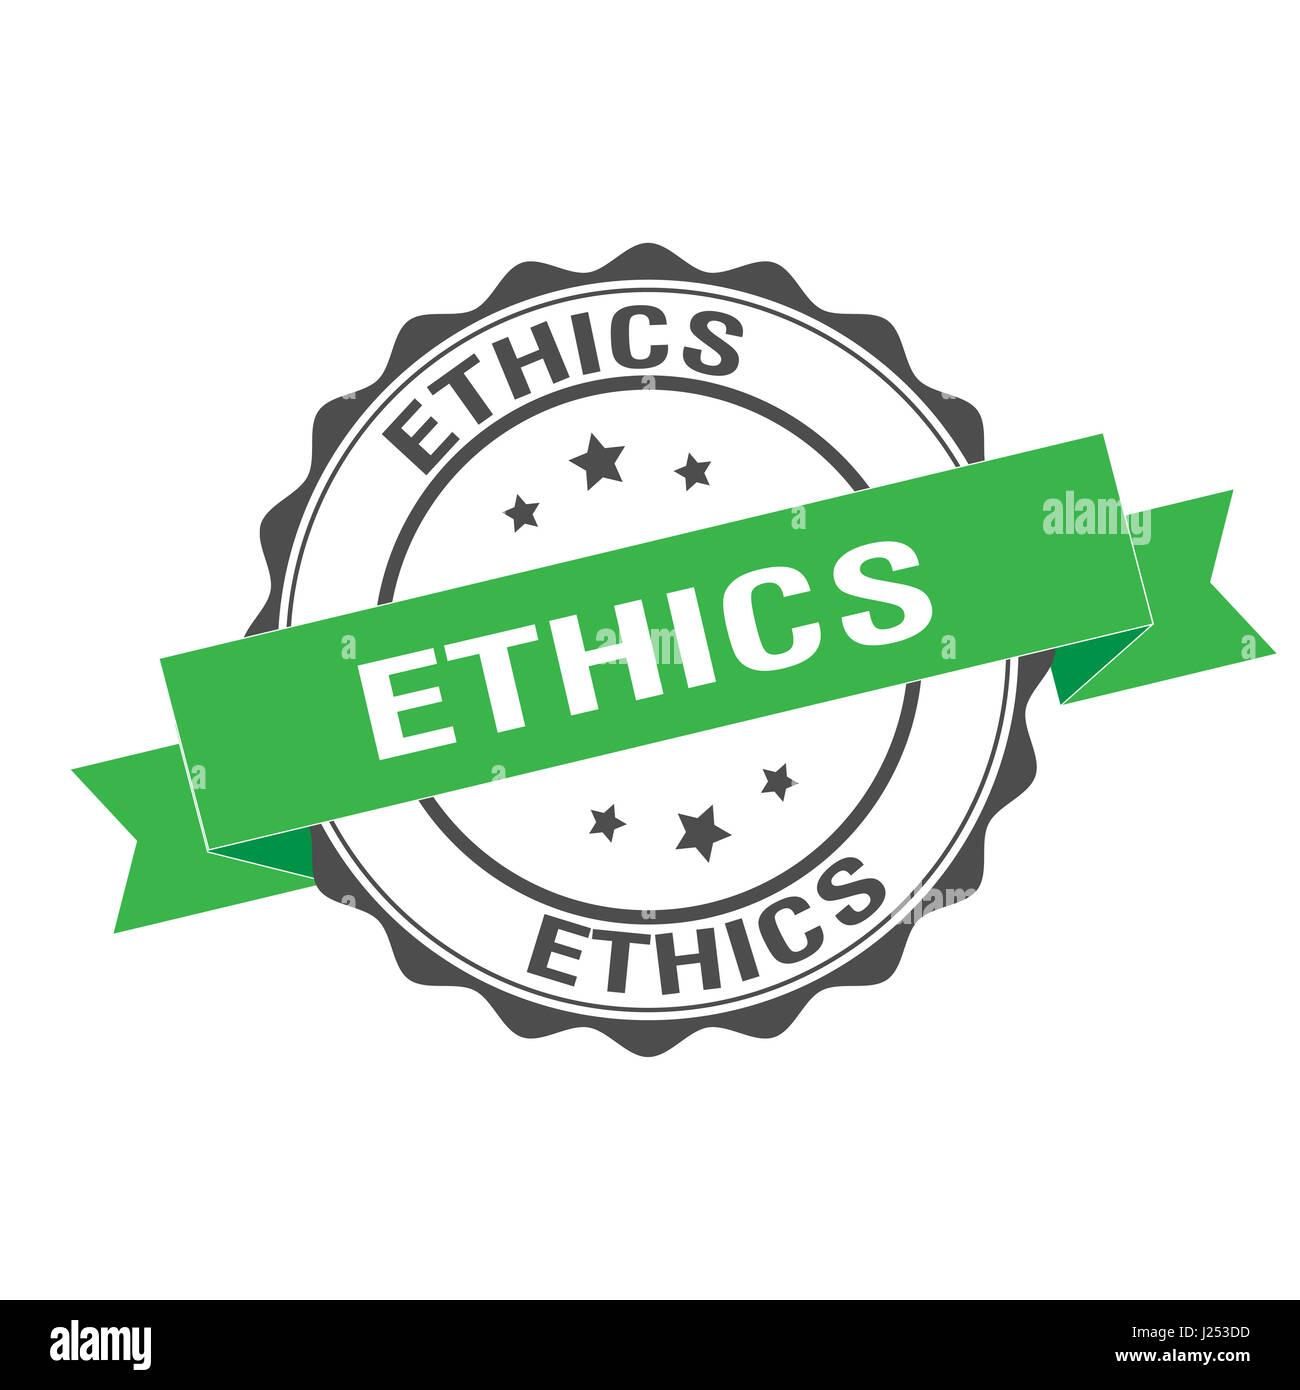 Ethics stamp illustration Stock Photo